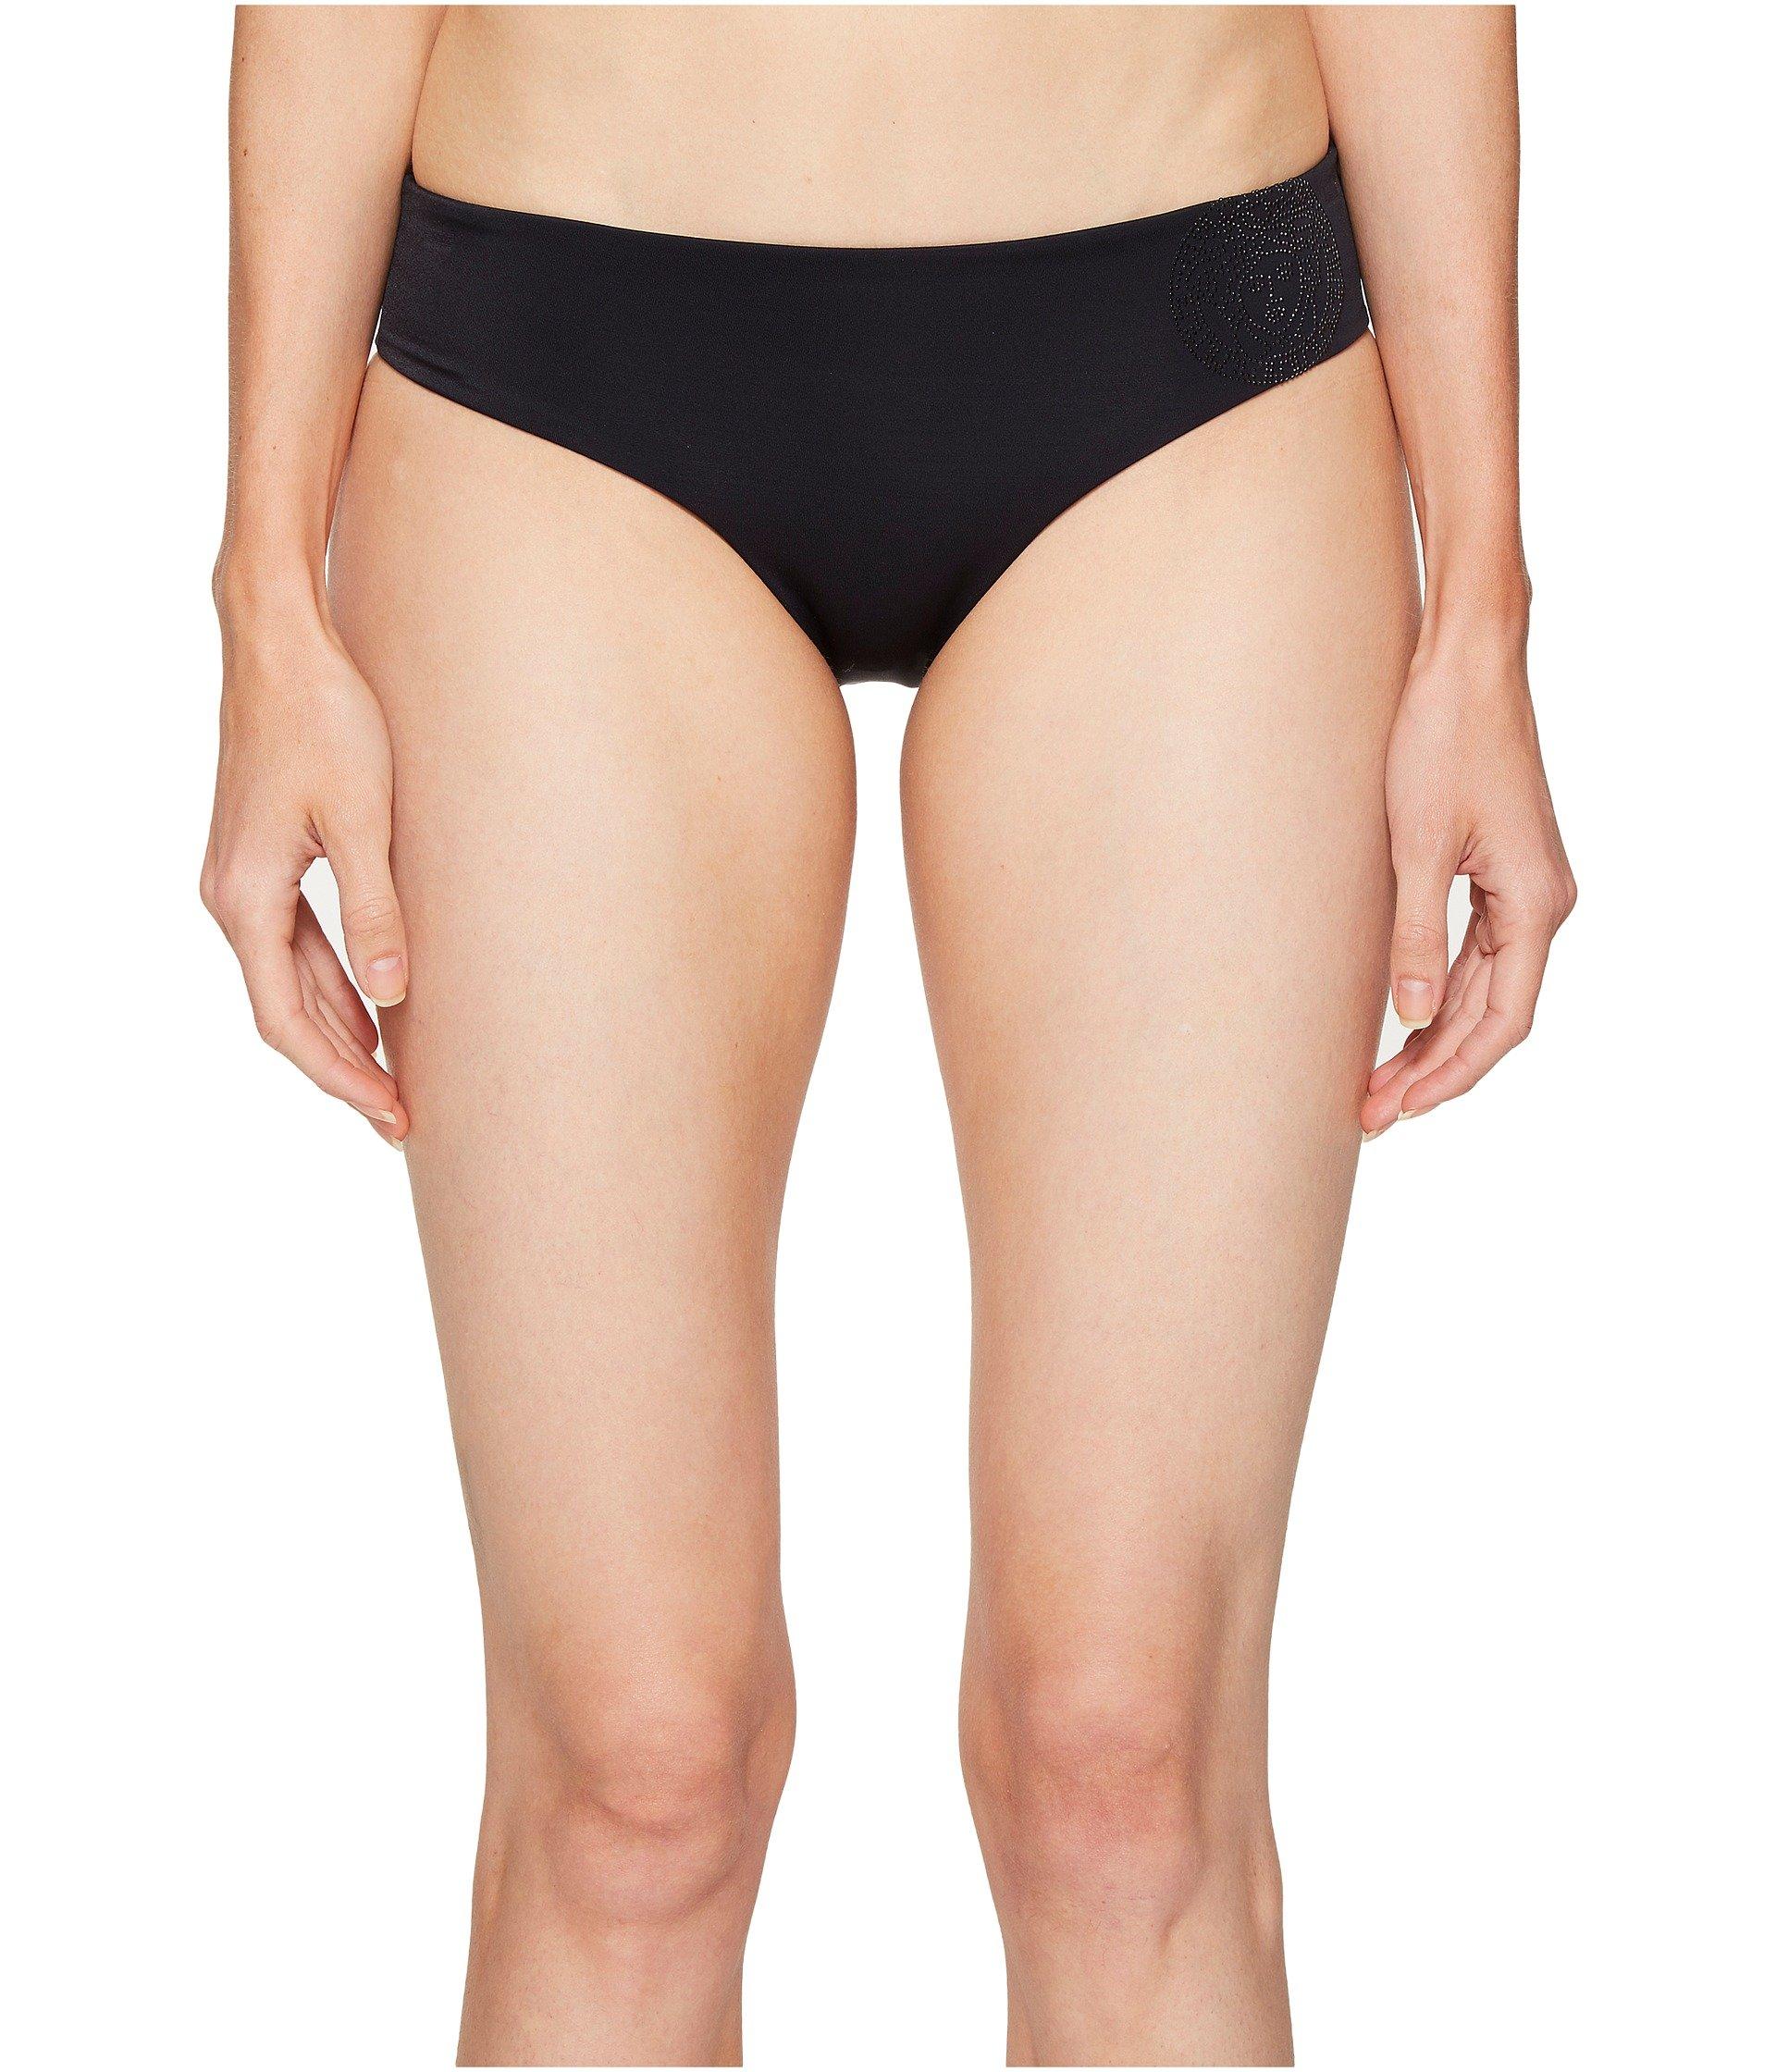 Bikini para Mujer Versace Slip Mare Bikini Bottom  + Versace en VeoyCompro.net